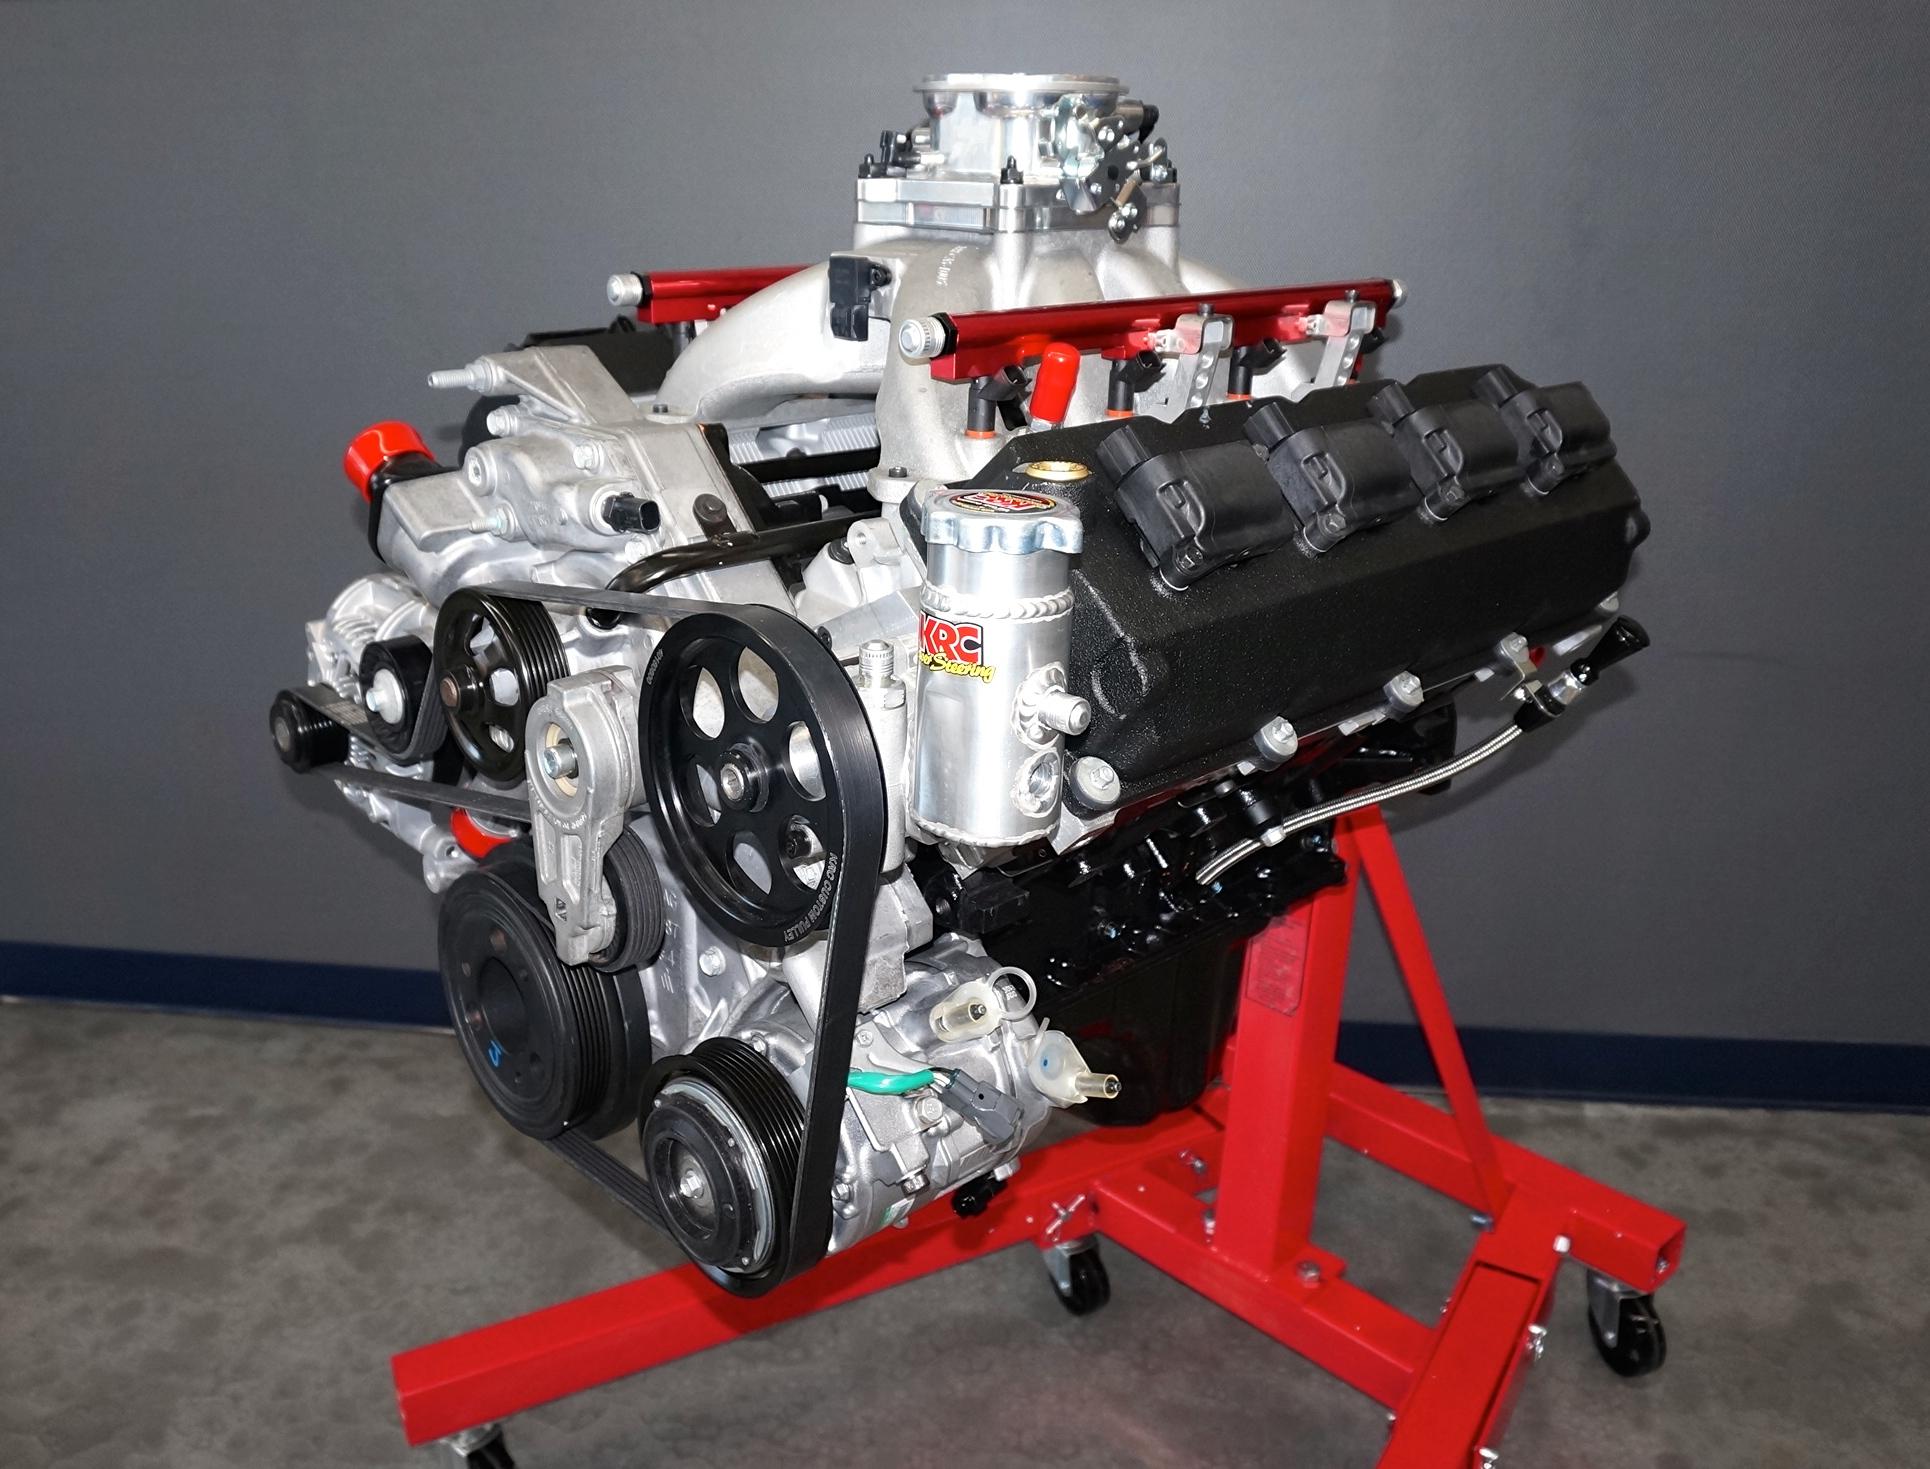 Dsc on 426 Hemi Crate Engine